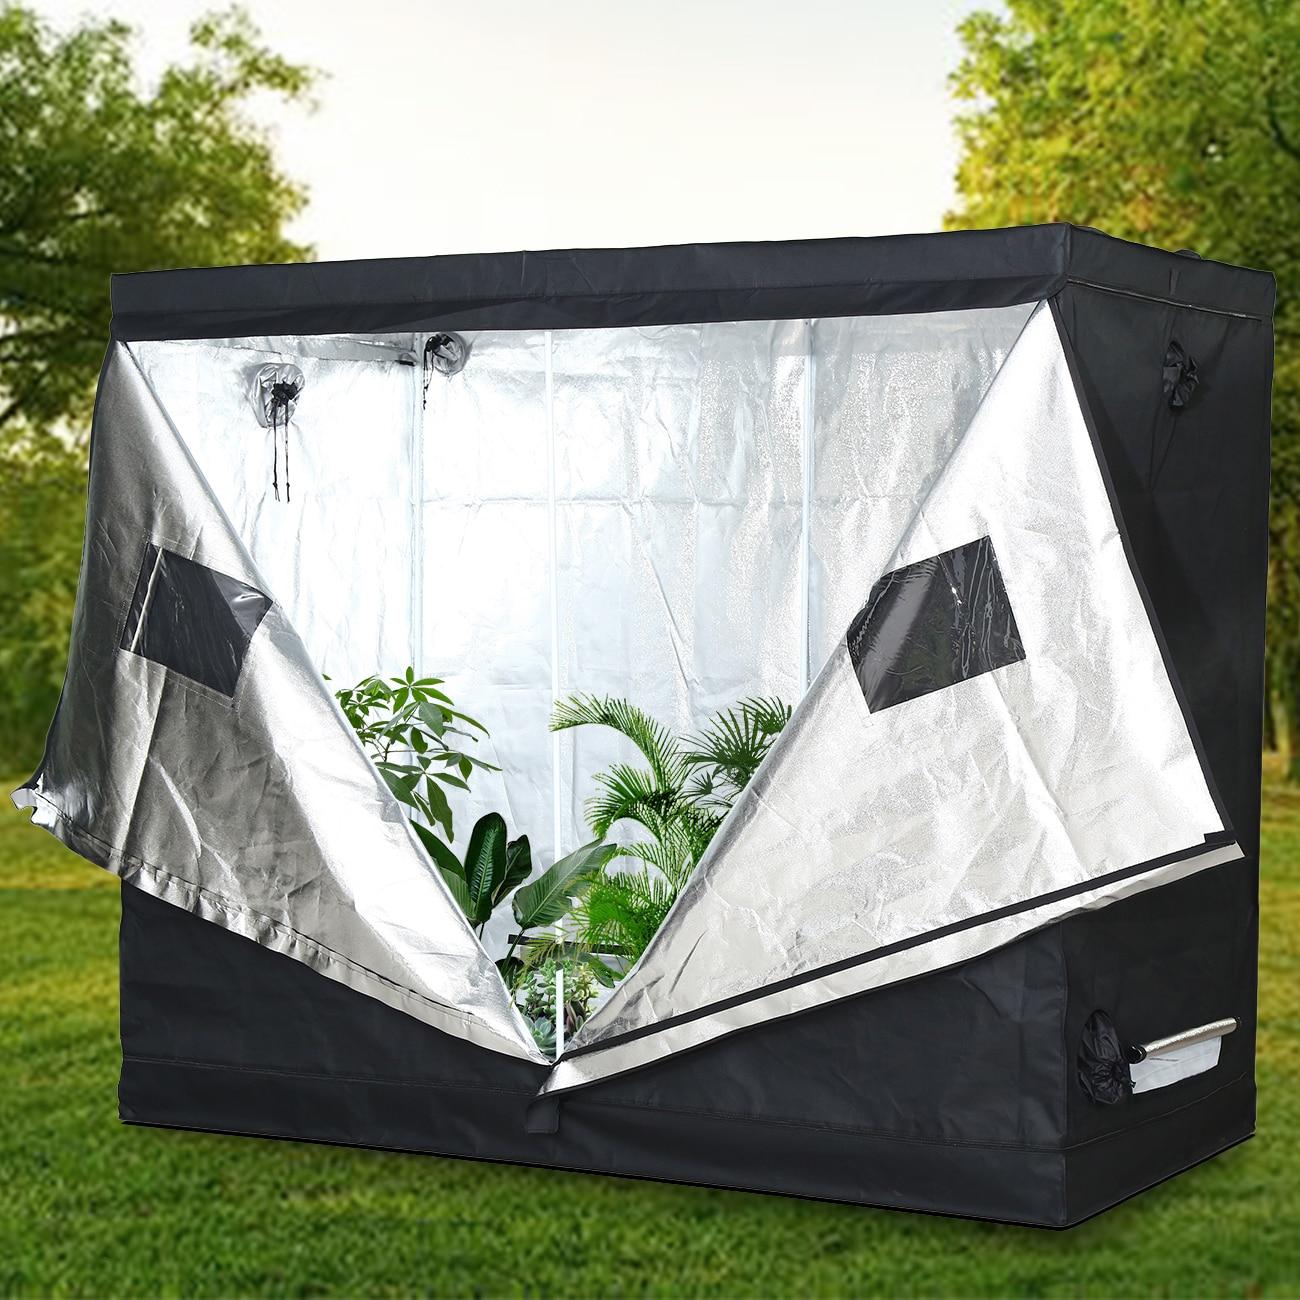 Yonntech 243×122×199 CM Grow Tent Indoor Hydroponics Led Grow Light Grow Room Plant Growing Reflective Garden Greenhouse